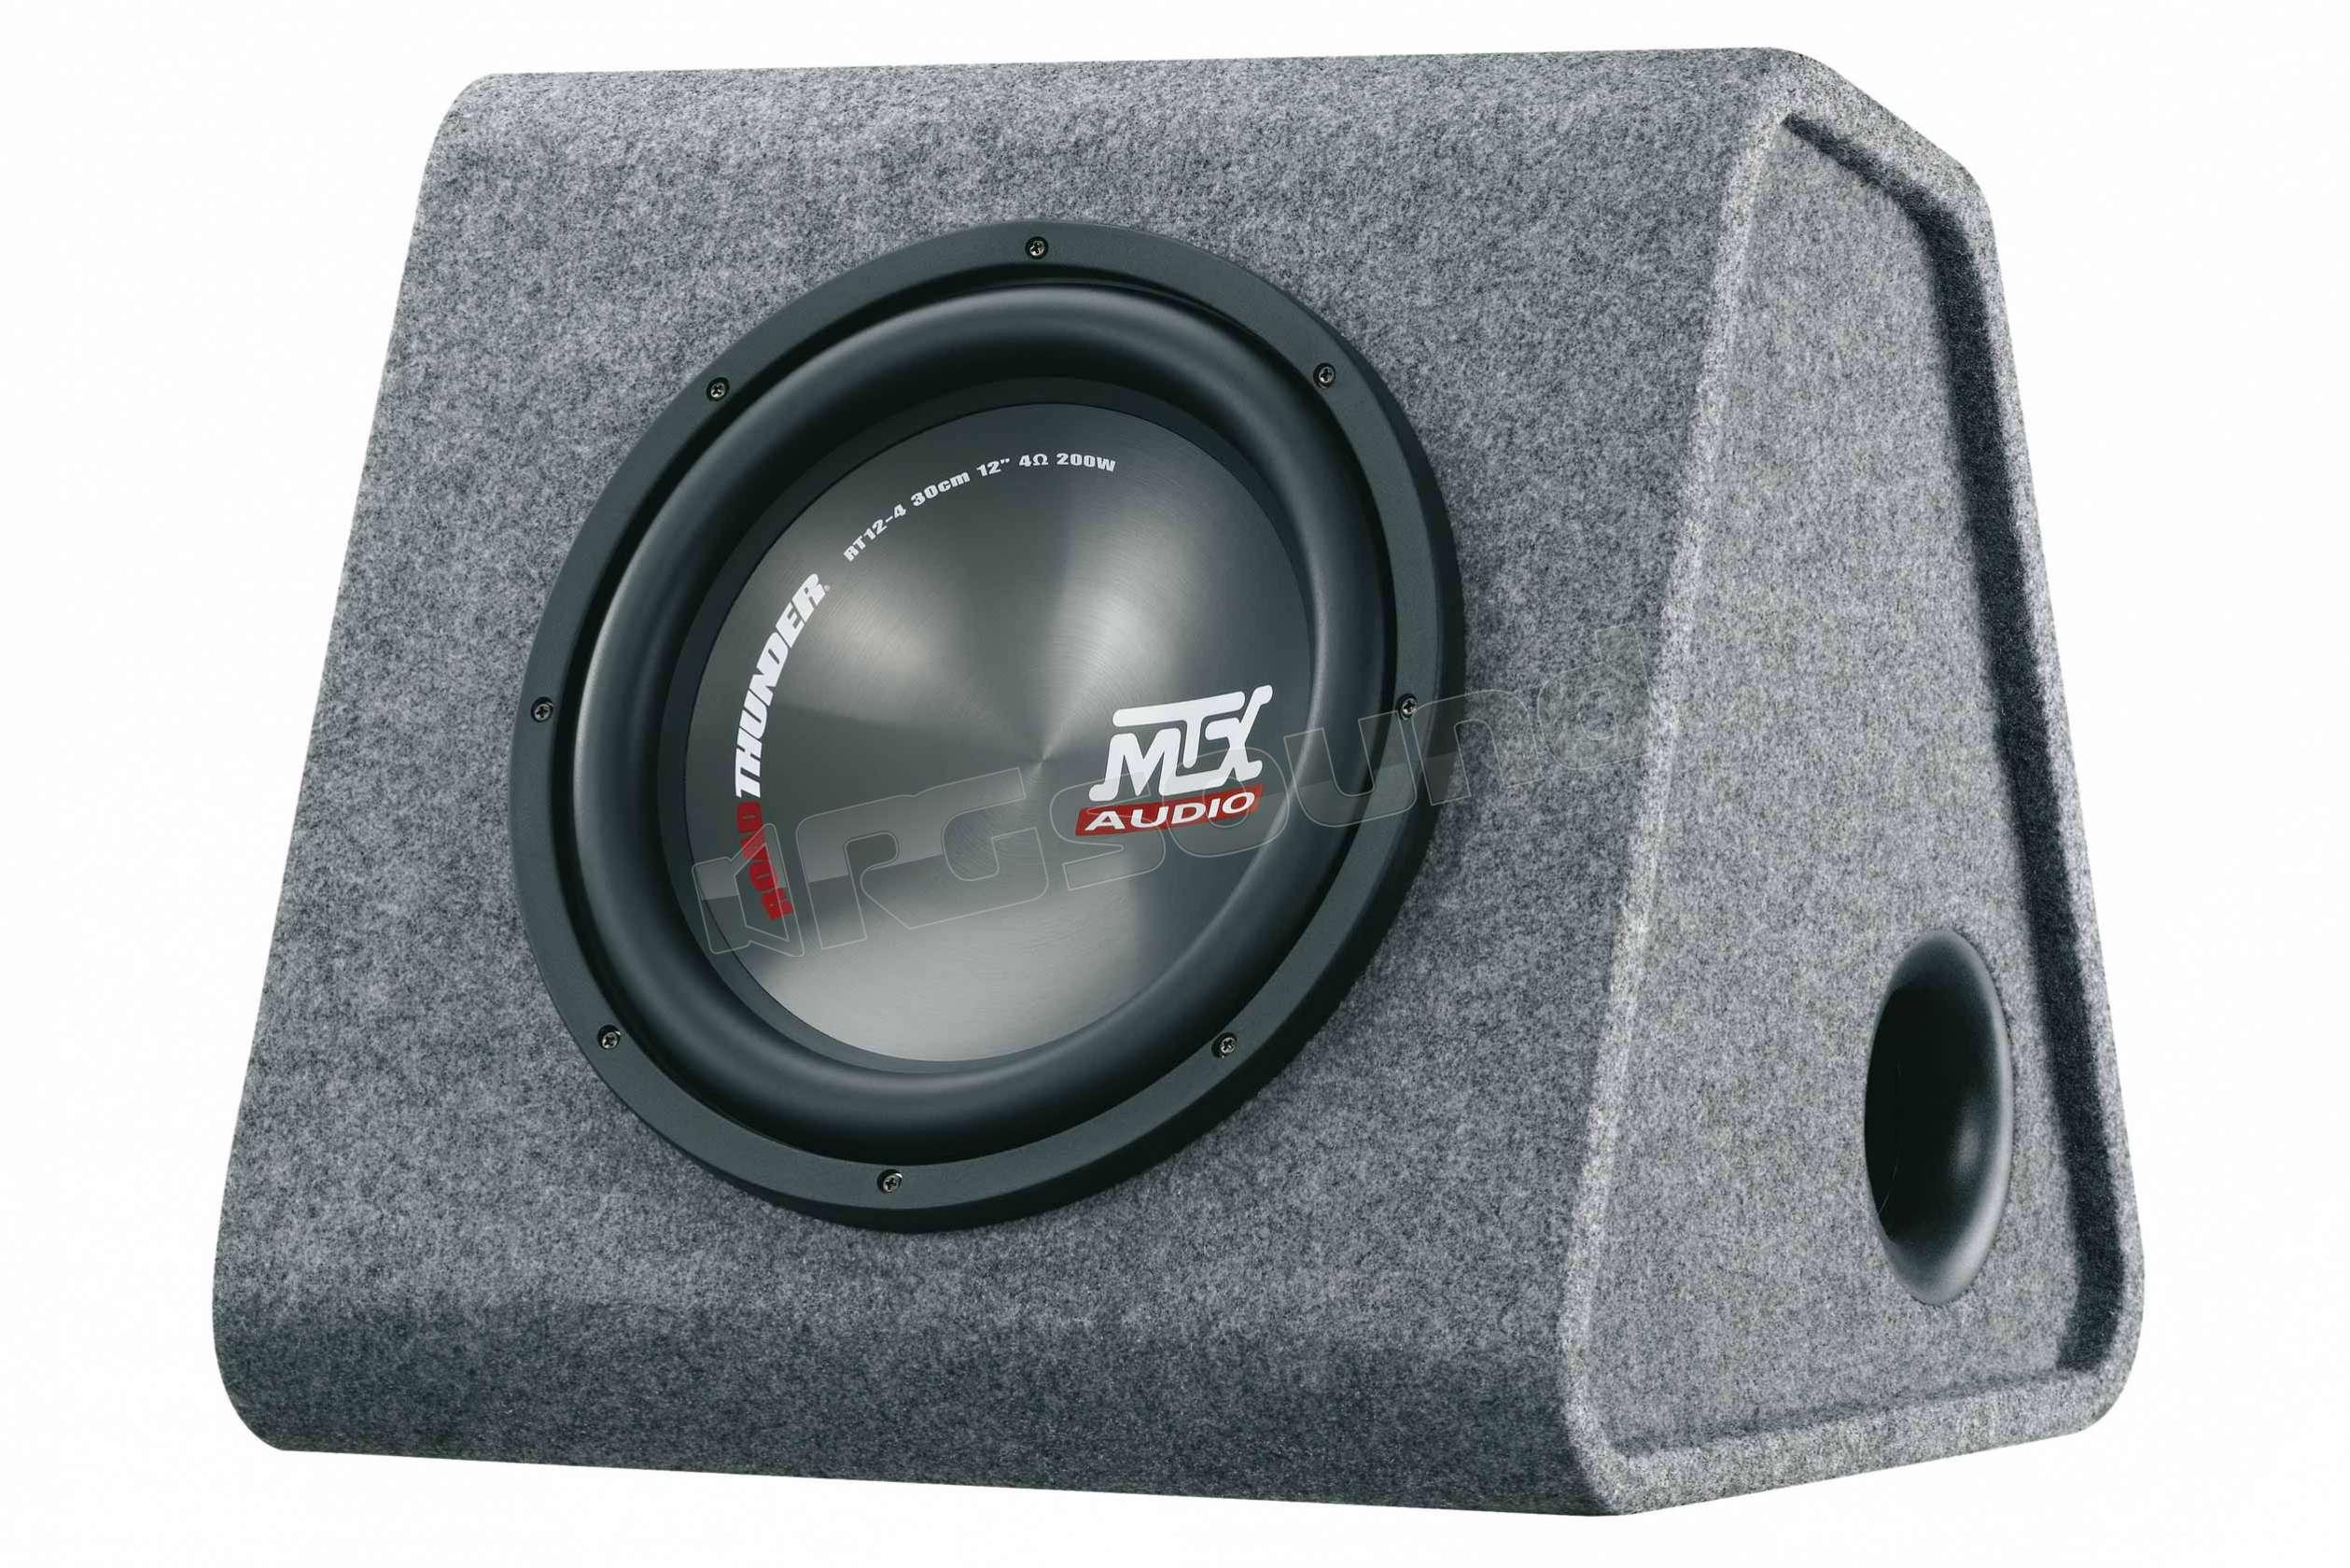 Mtx audio rtp 12 subwoofer subwoofer amplificati rg sound store - Subwoofer attivo casa ...